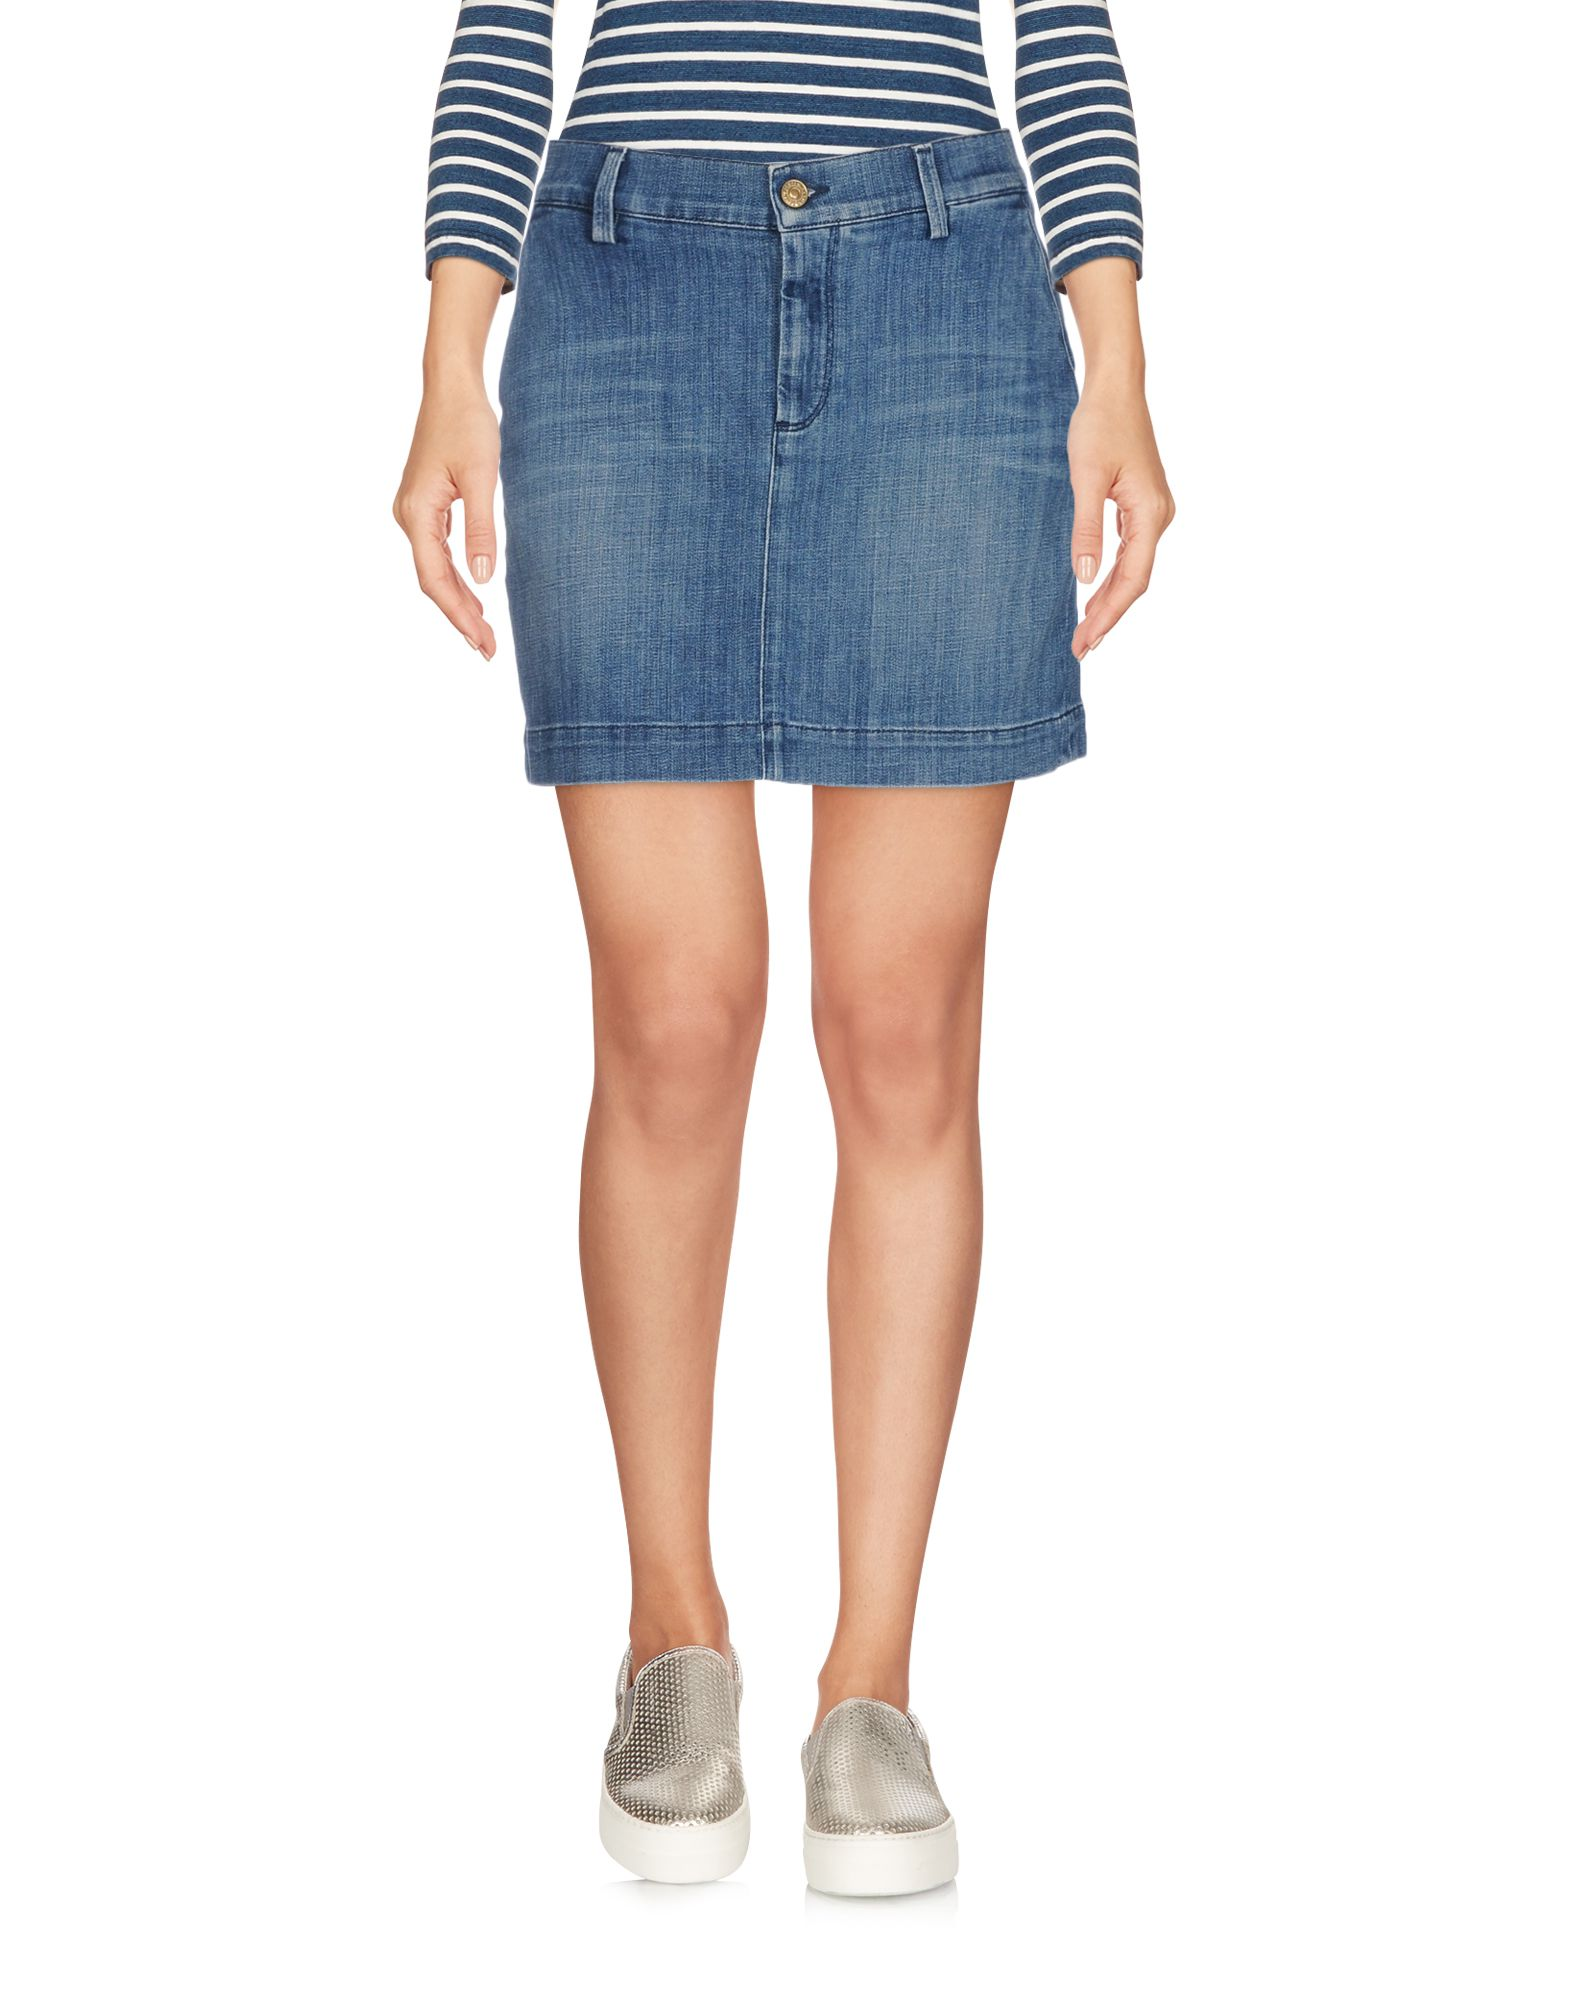 7 FOR ALL MANKIND Джинсовая юбка 7 for all mankind джинсовая верхняя одежда